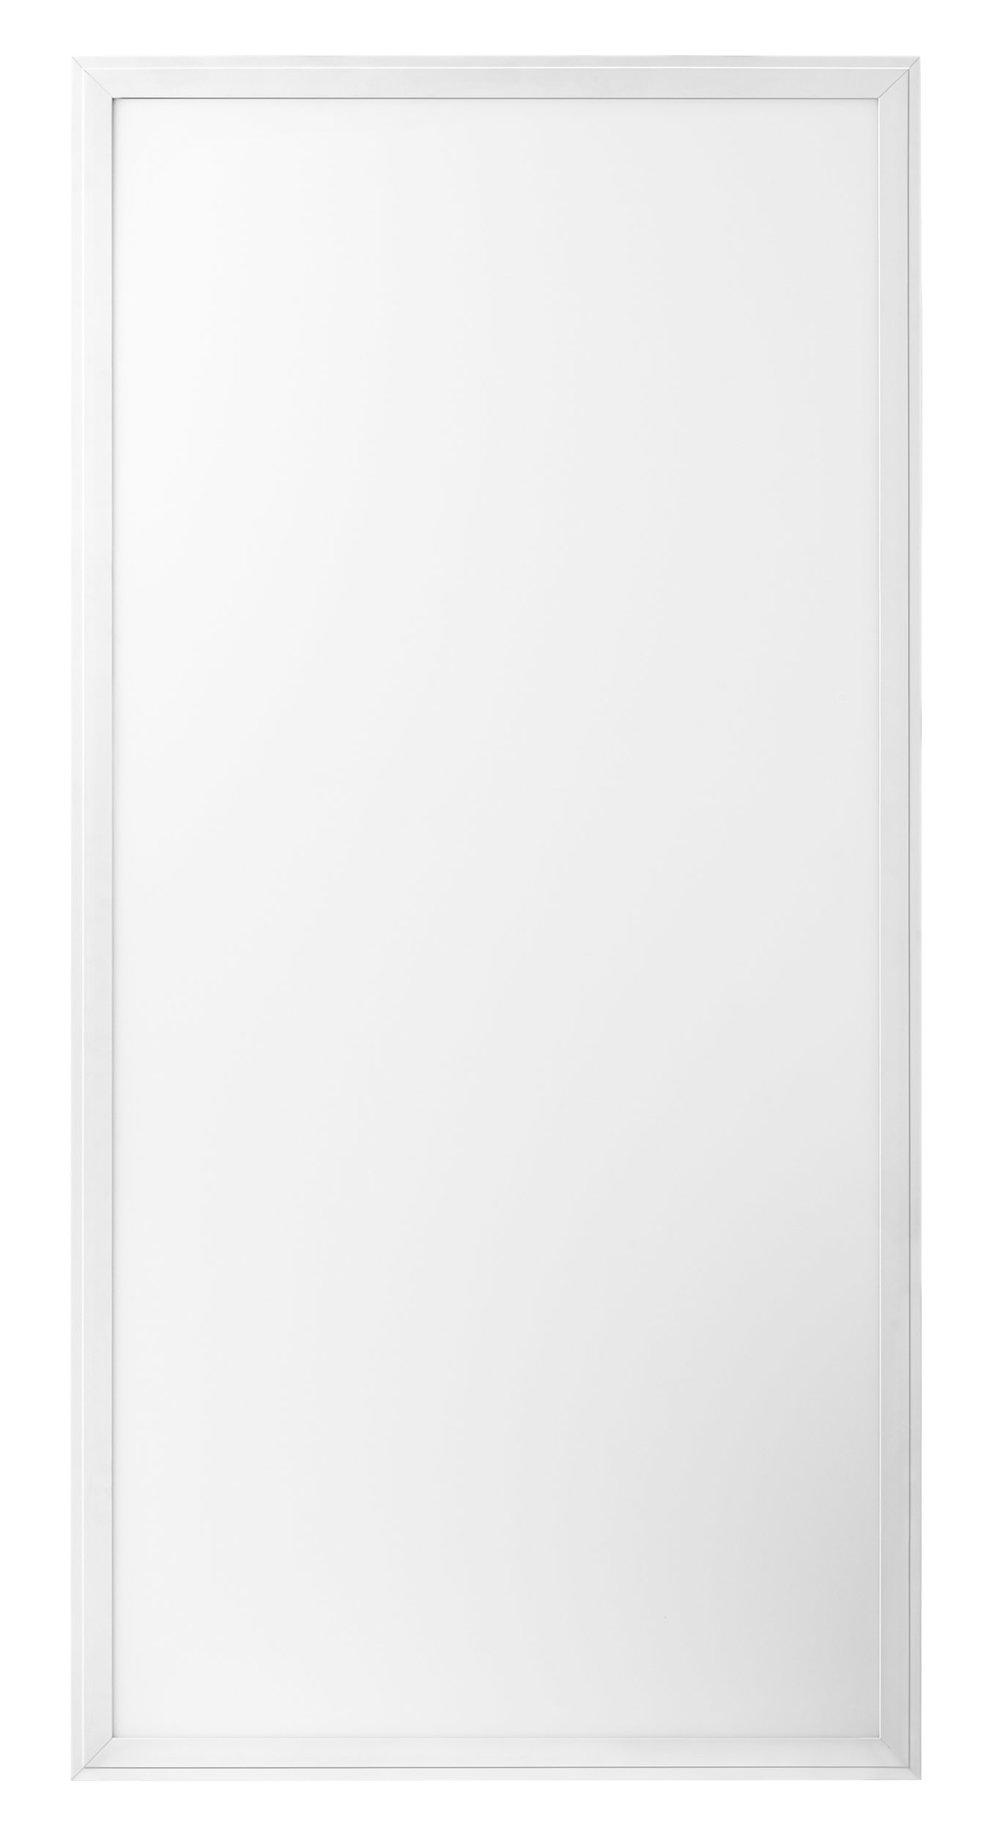 Panel Size_ 24.jpg